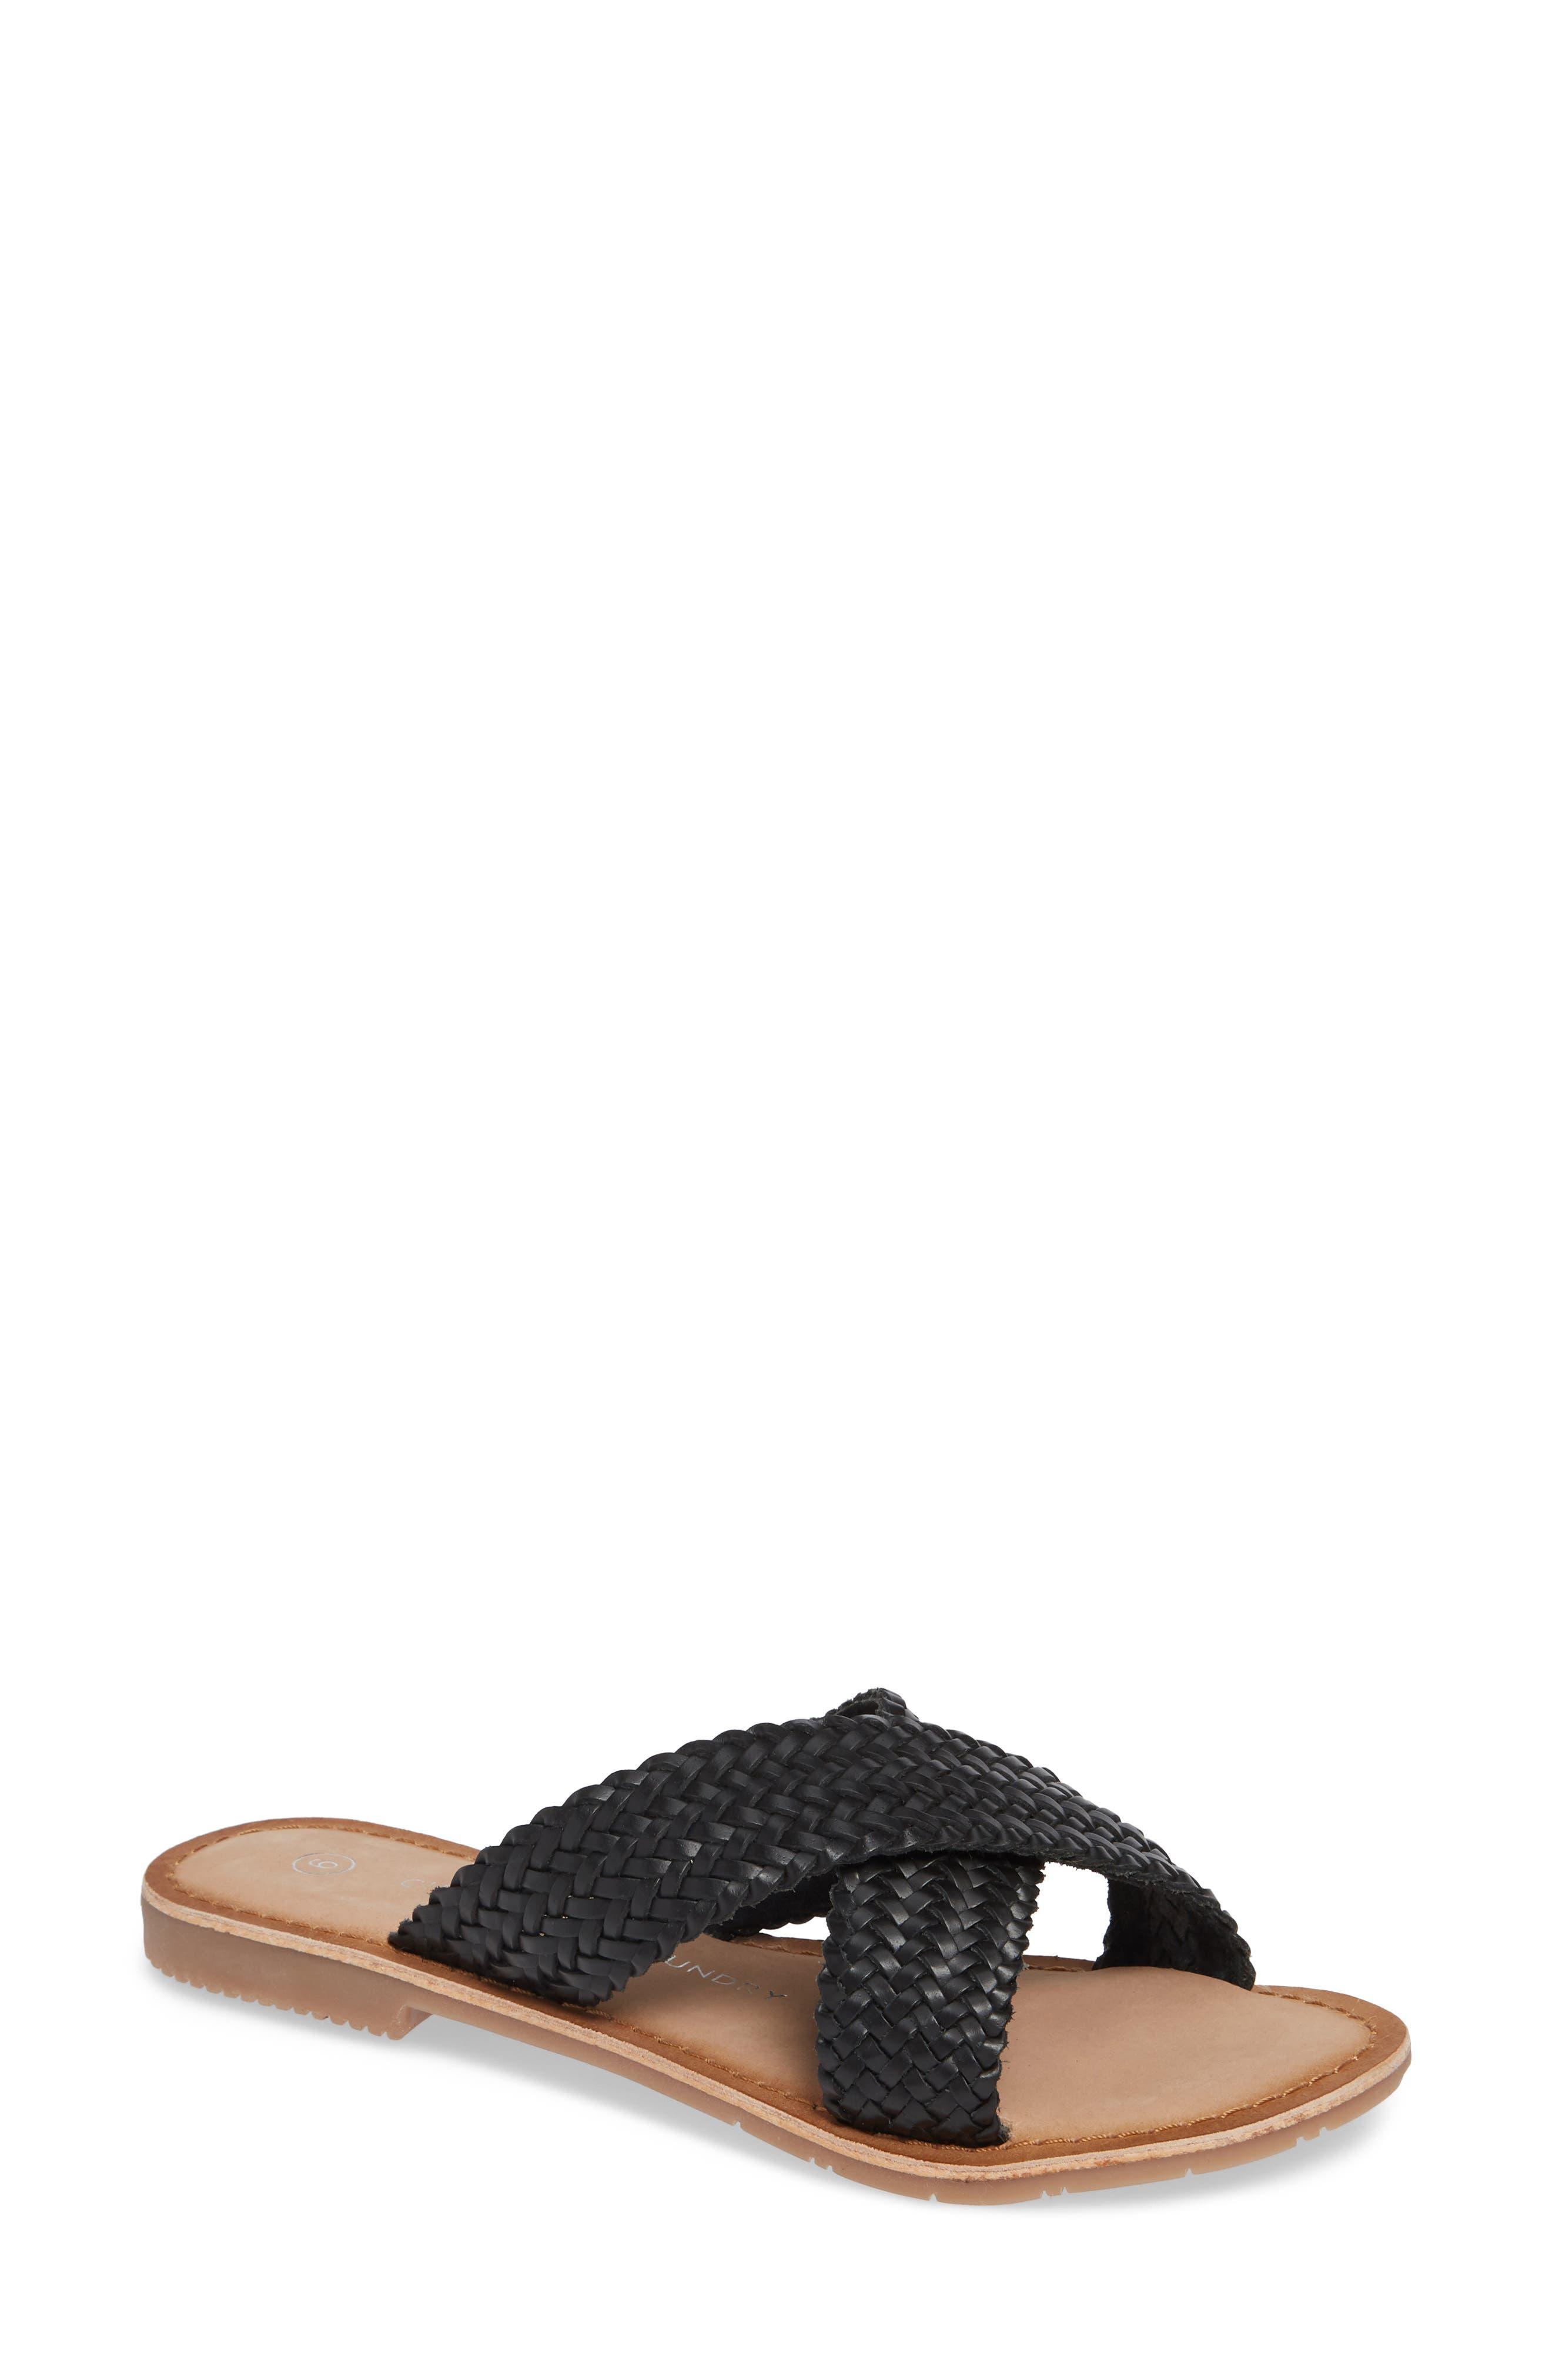 Pure Woven Slide Sandal,                             Main thumbnail 1, color,                             BLACK LEATHER